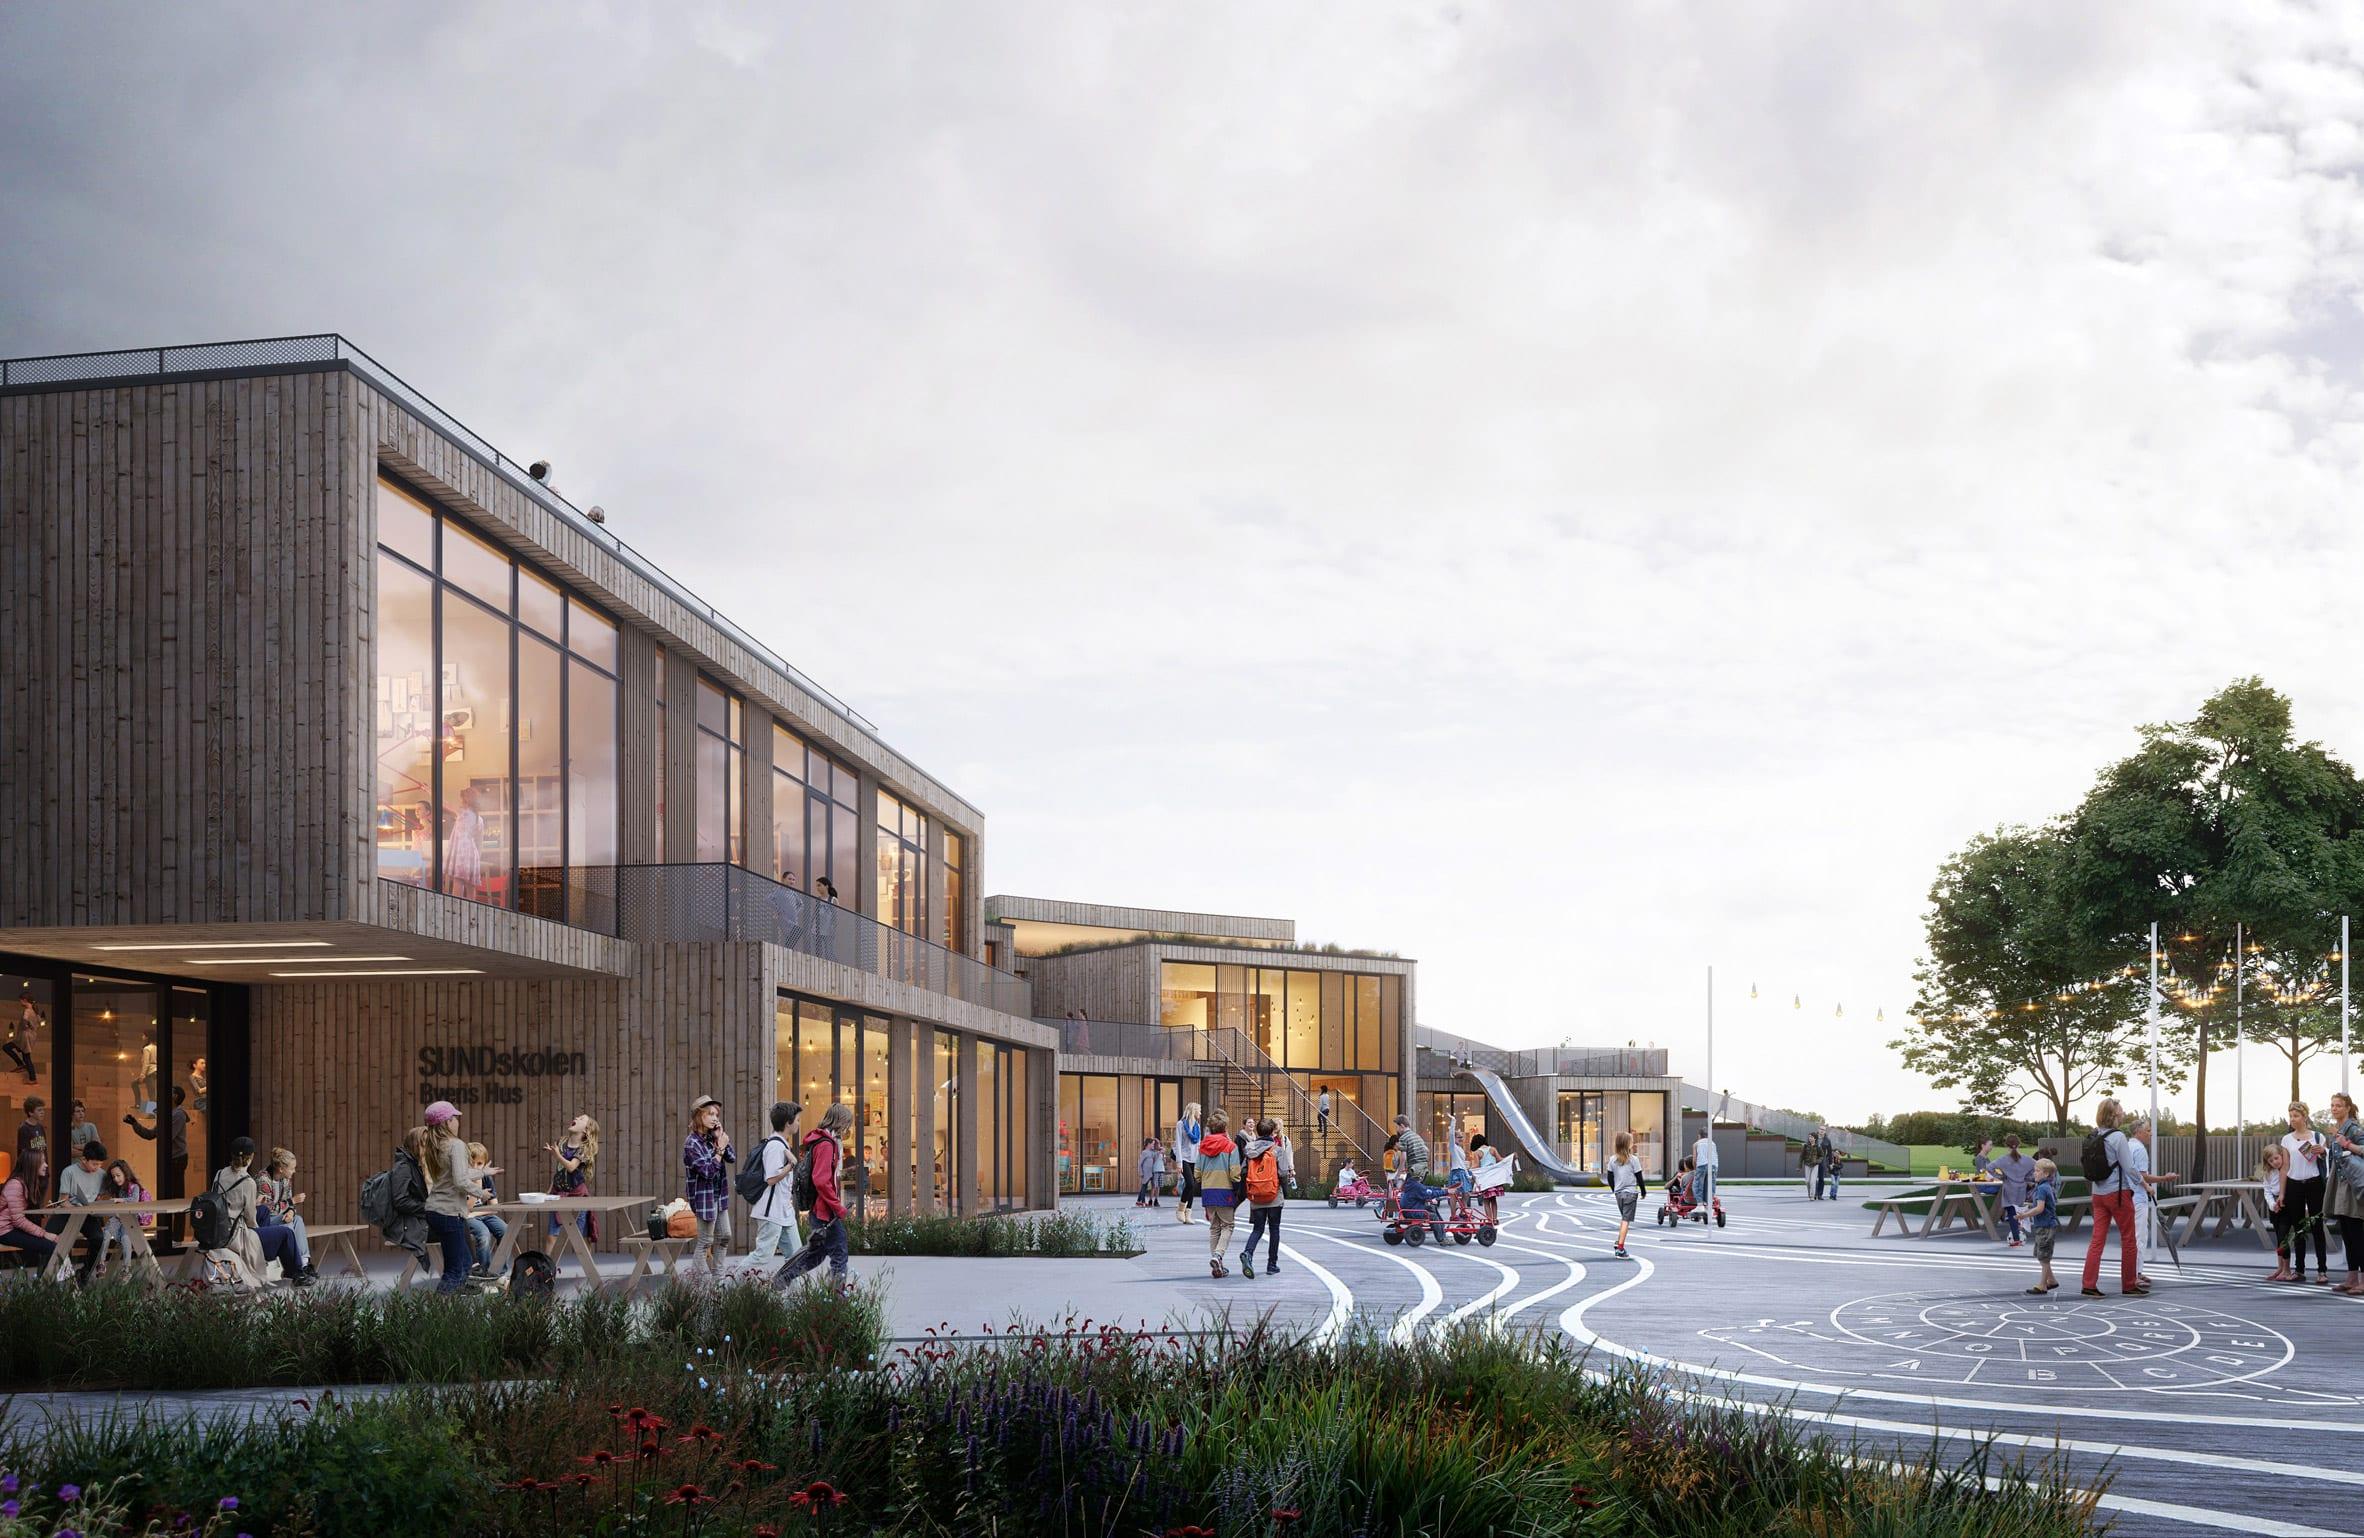 Render of The New School by Henning Larsen